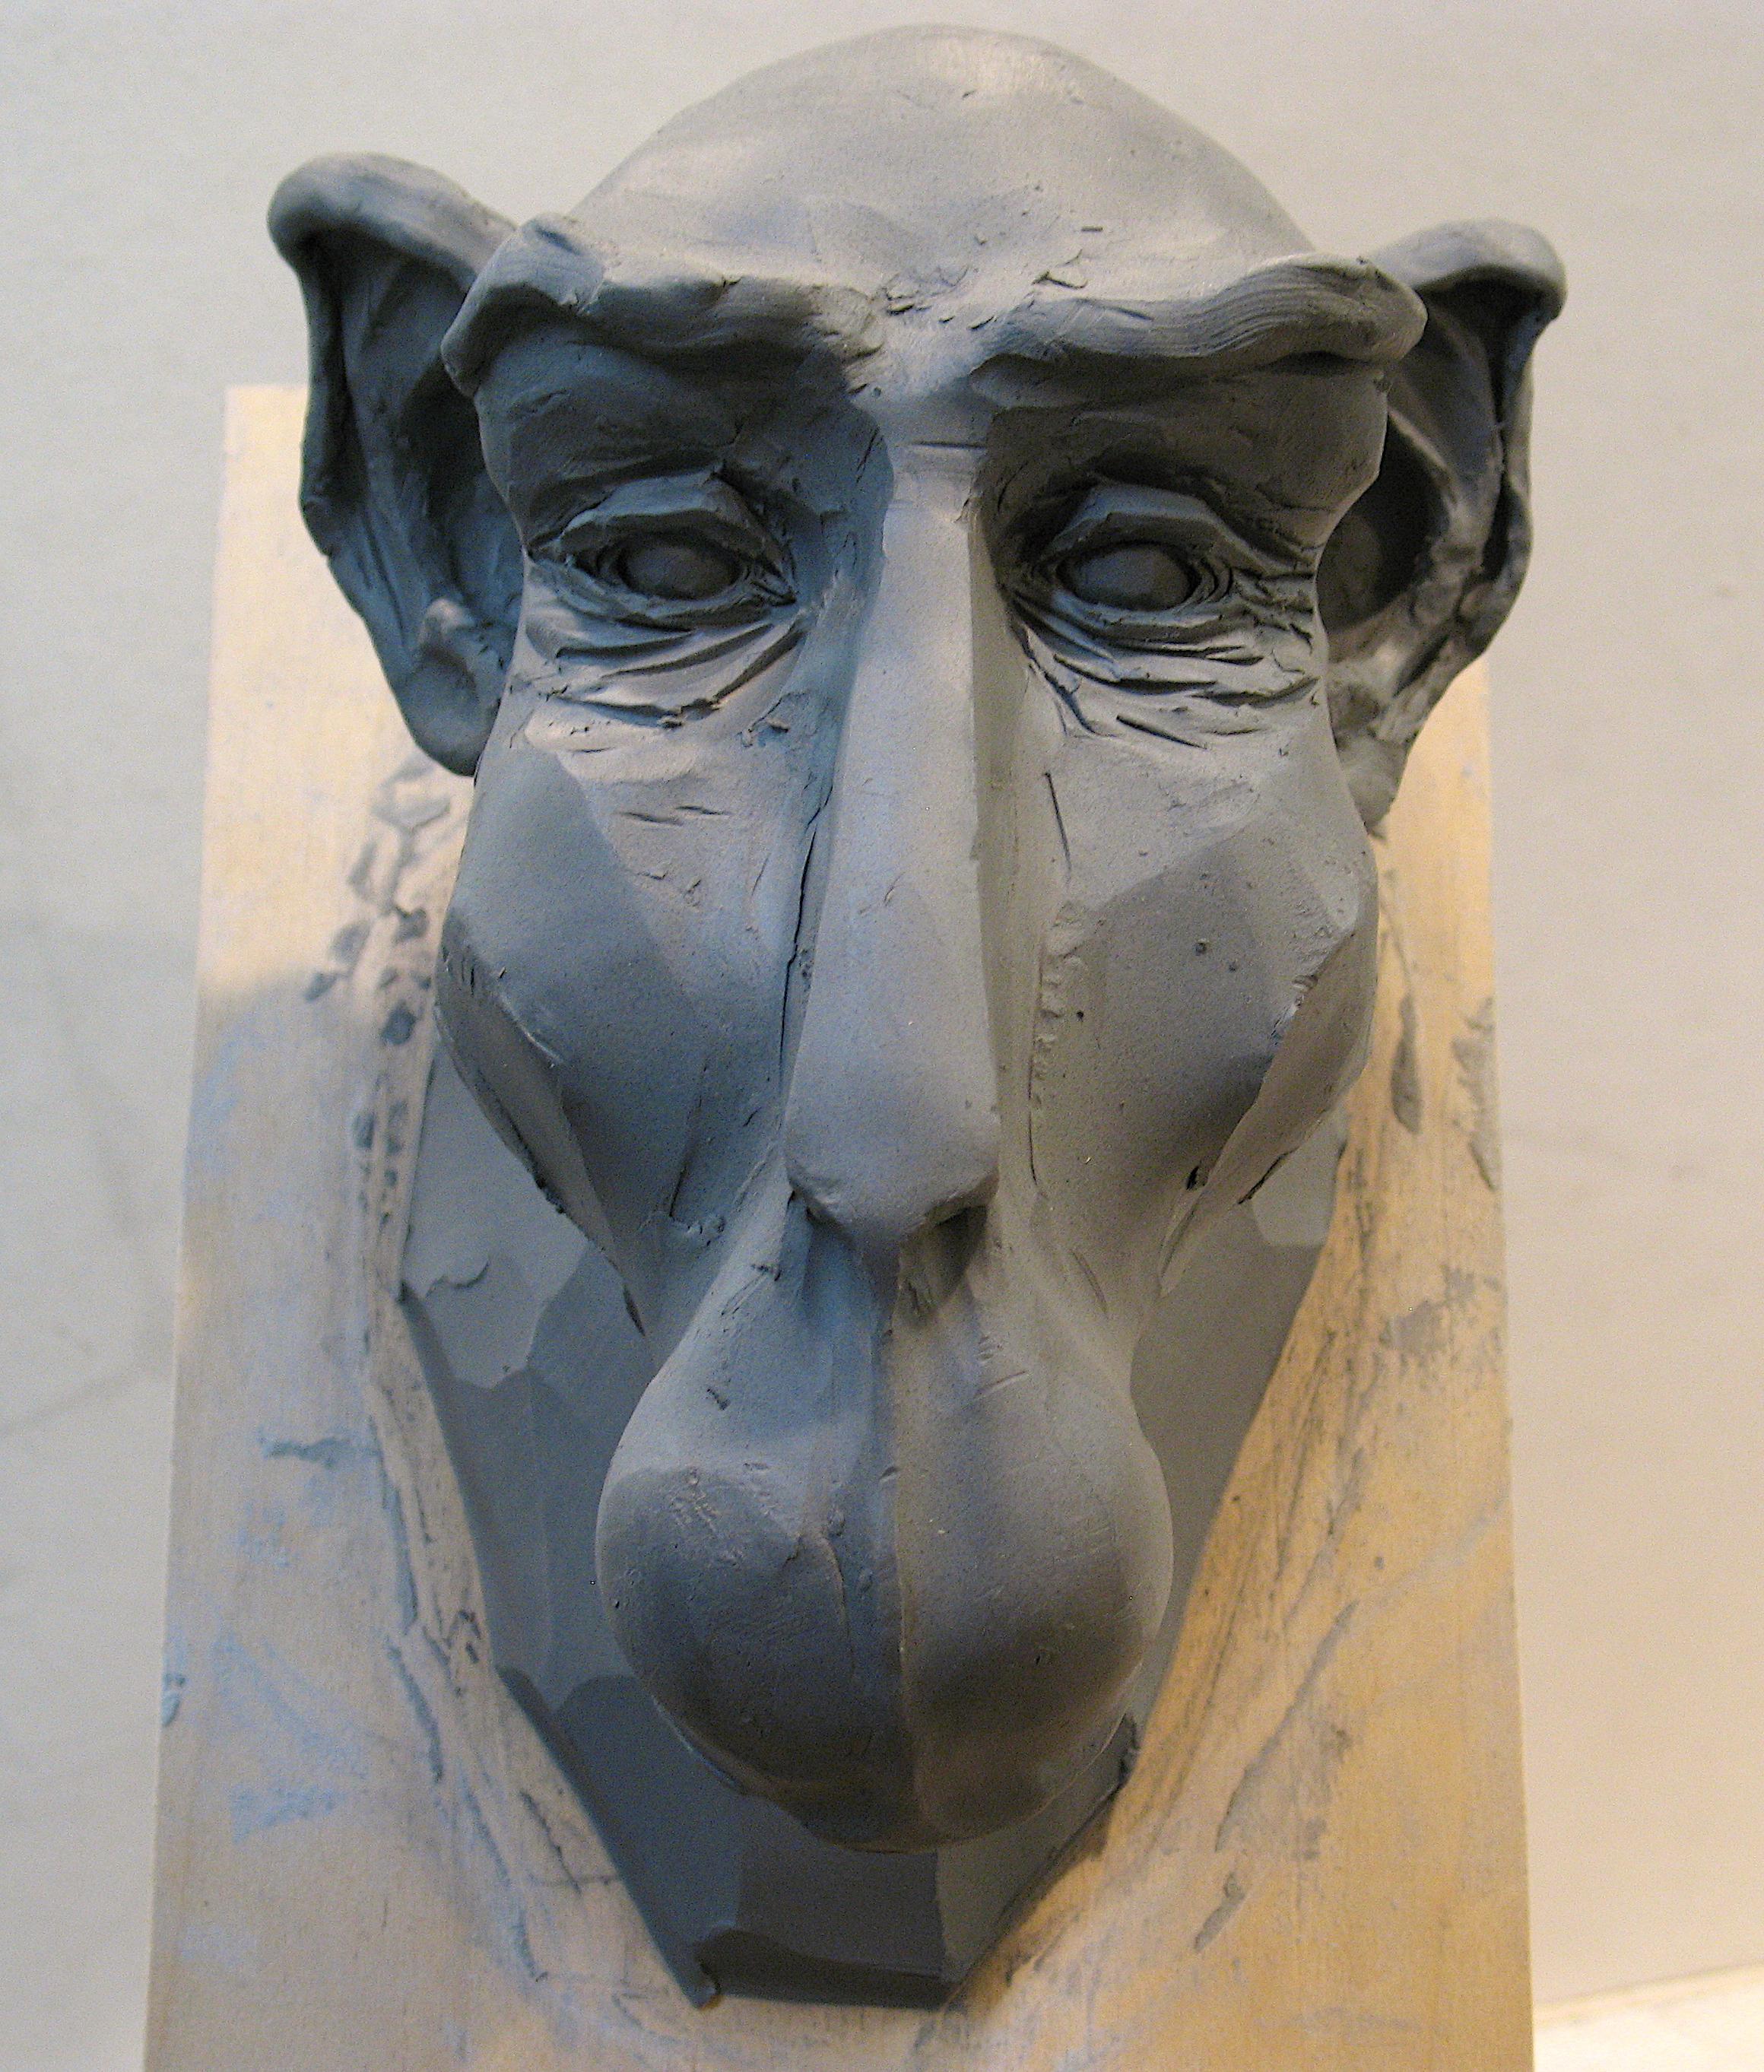 Steve Eichenberger sculpture WIP